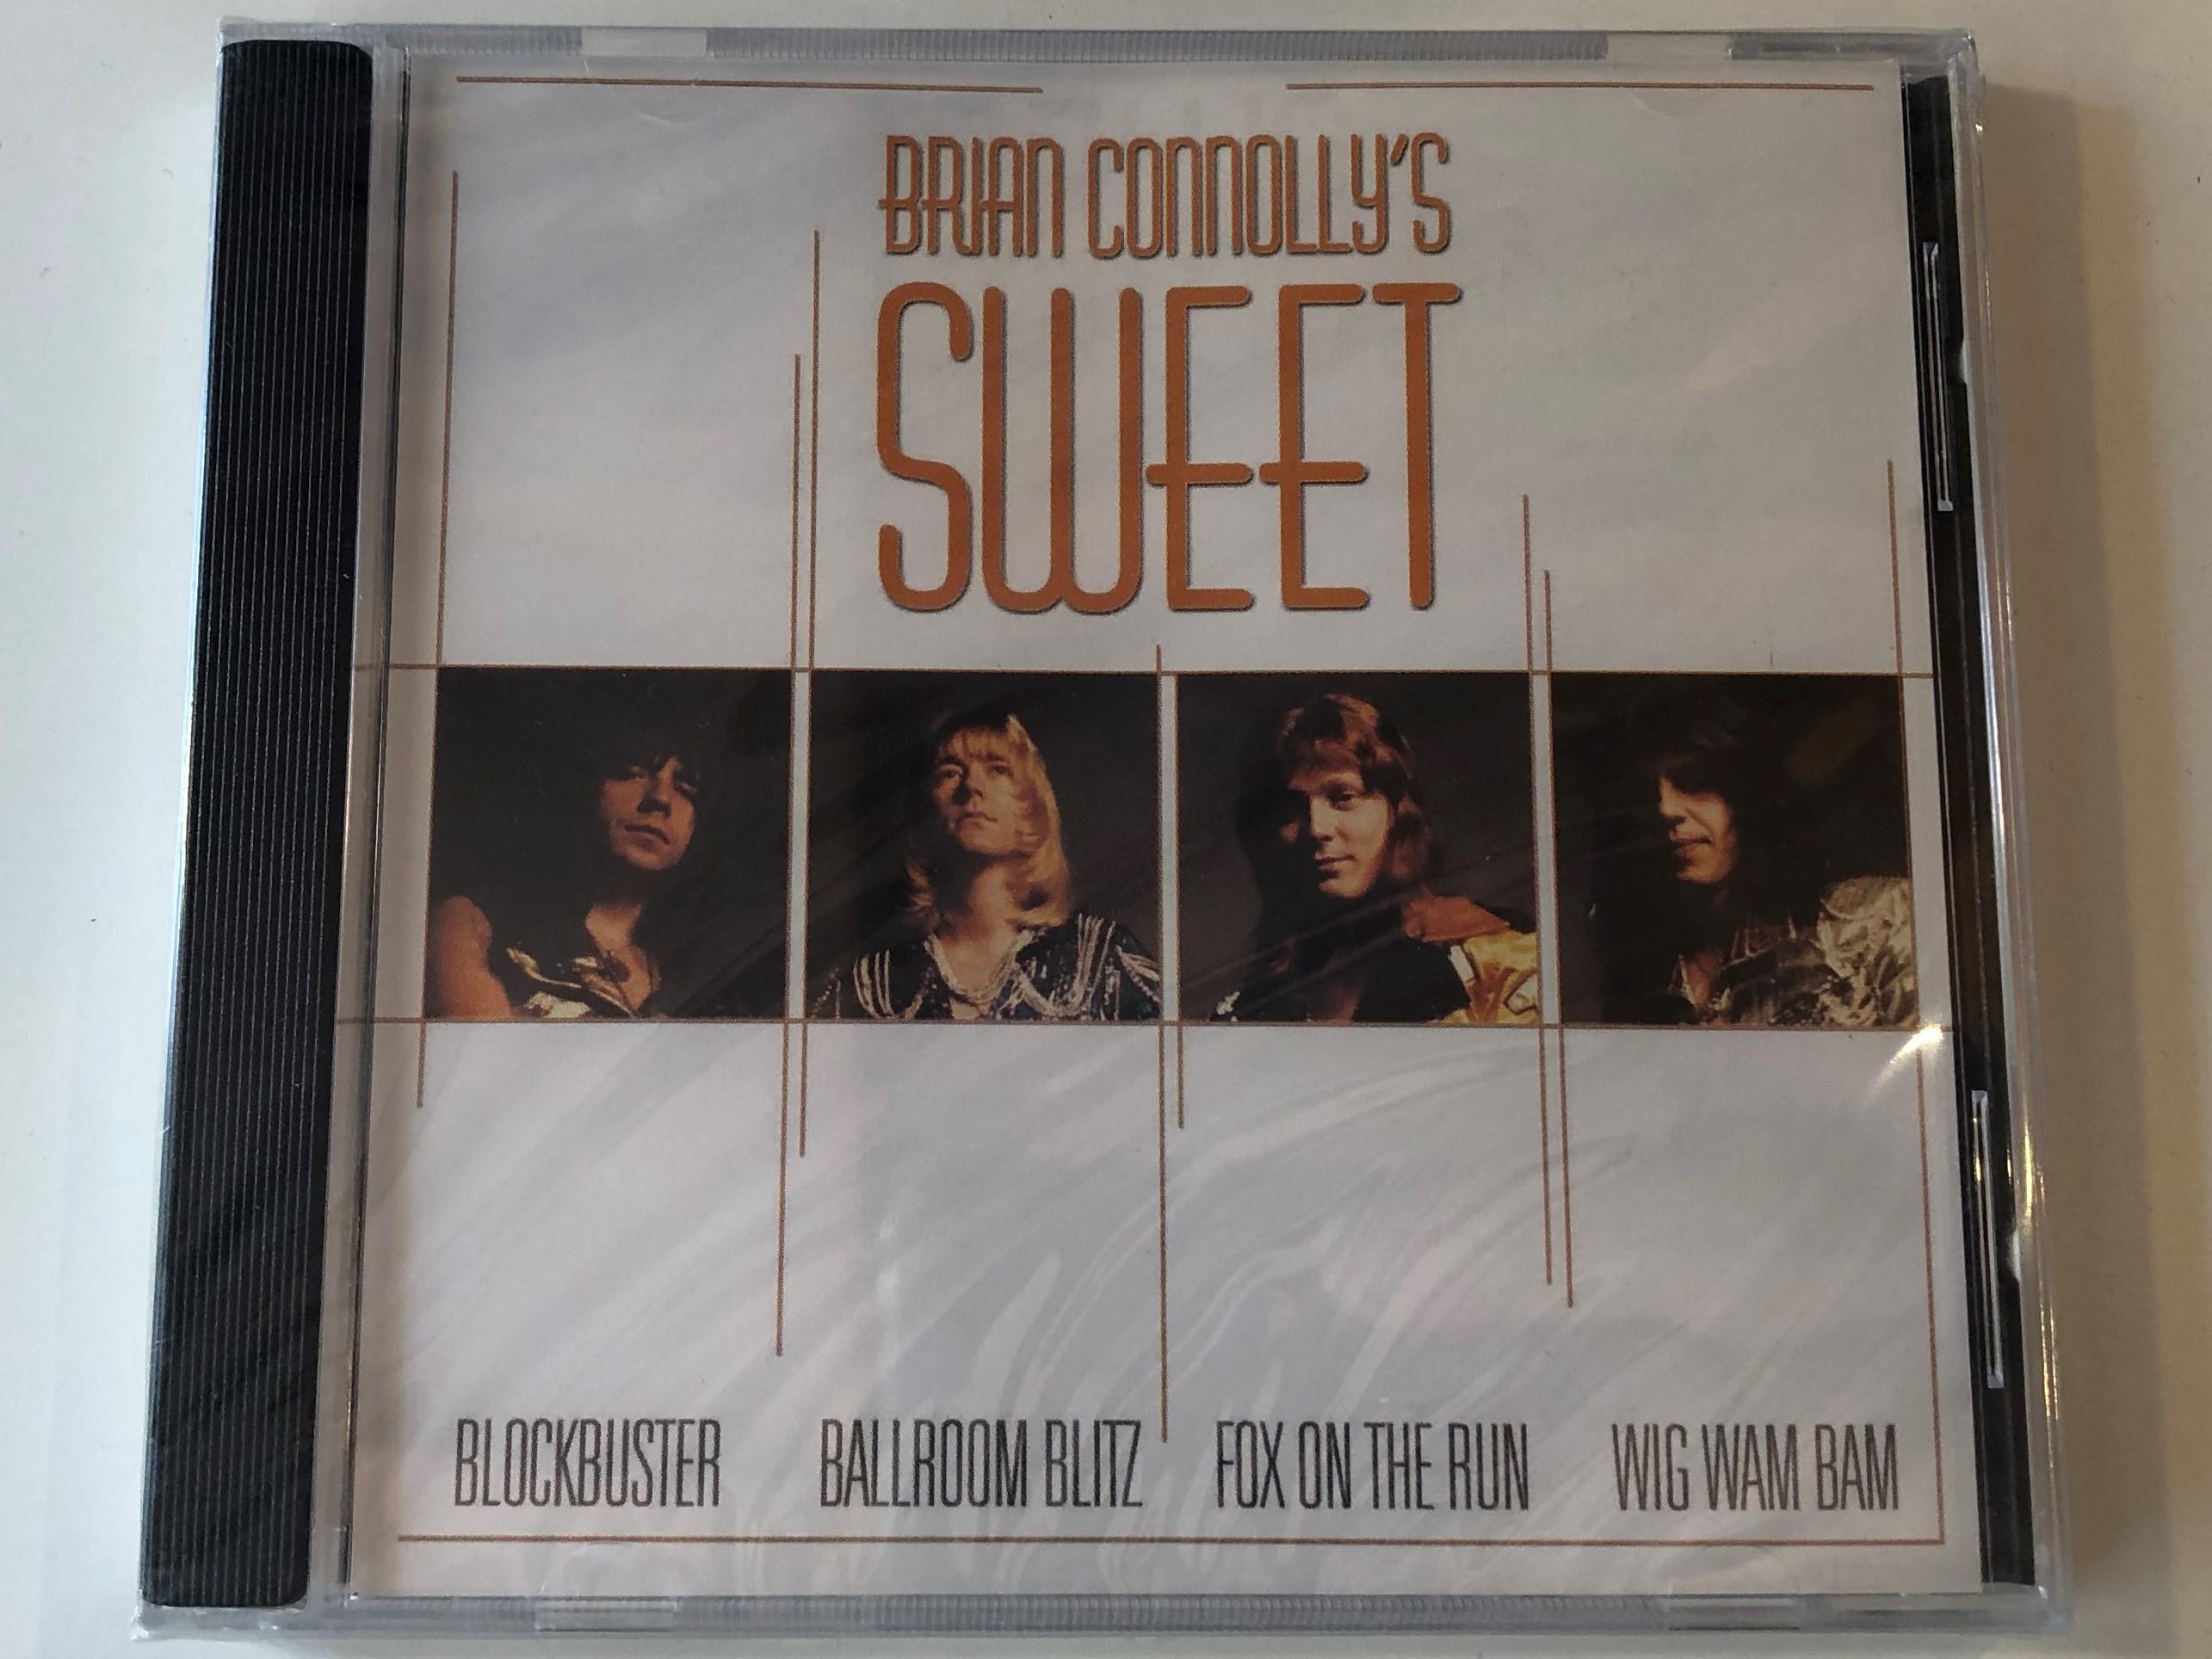 brian-connolly-s-sweet-blockbuster-ballroom-blitz-fox-on-the-run-wig-wam-bam-forever-gold-audio-cd-2001-fg101-1-.jpg